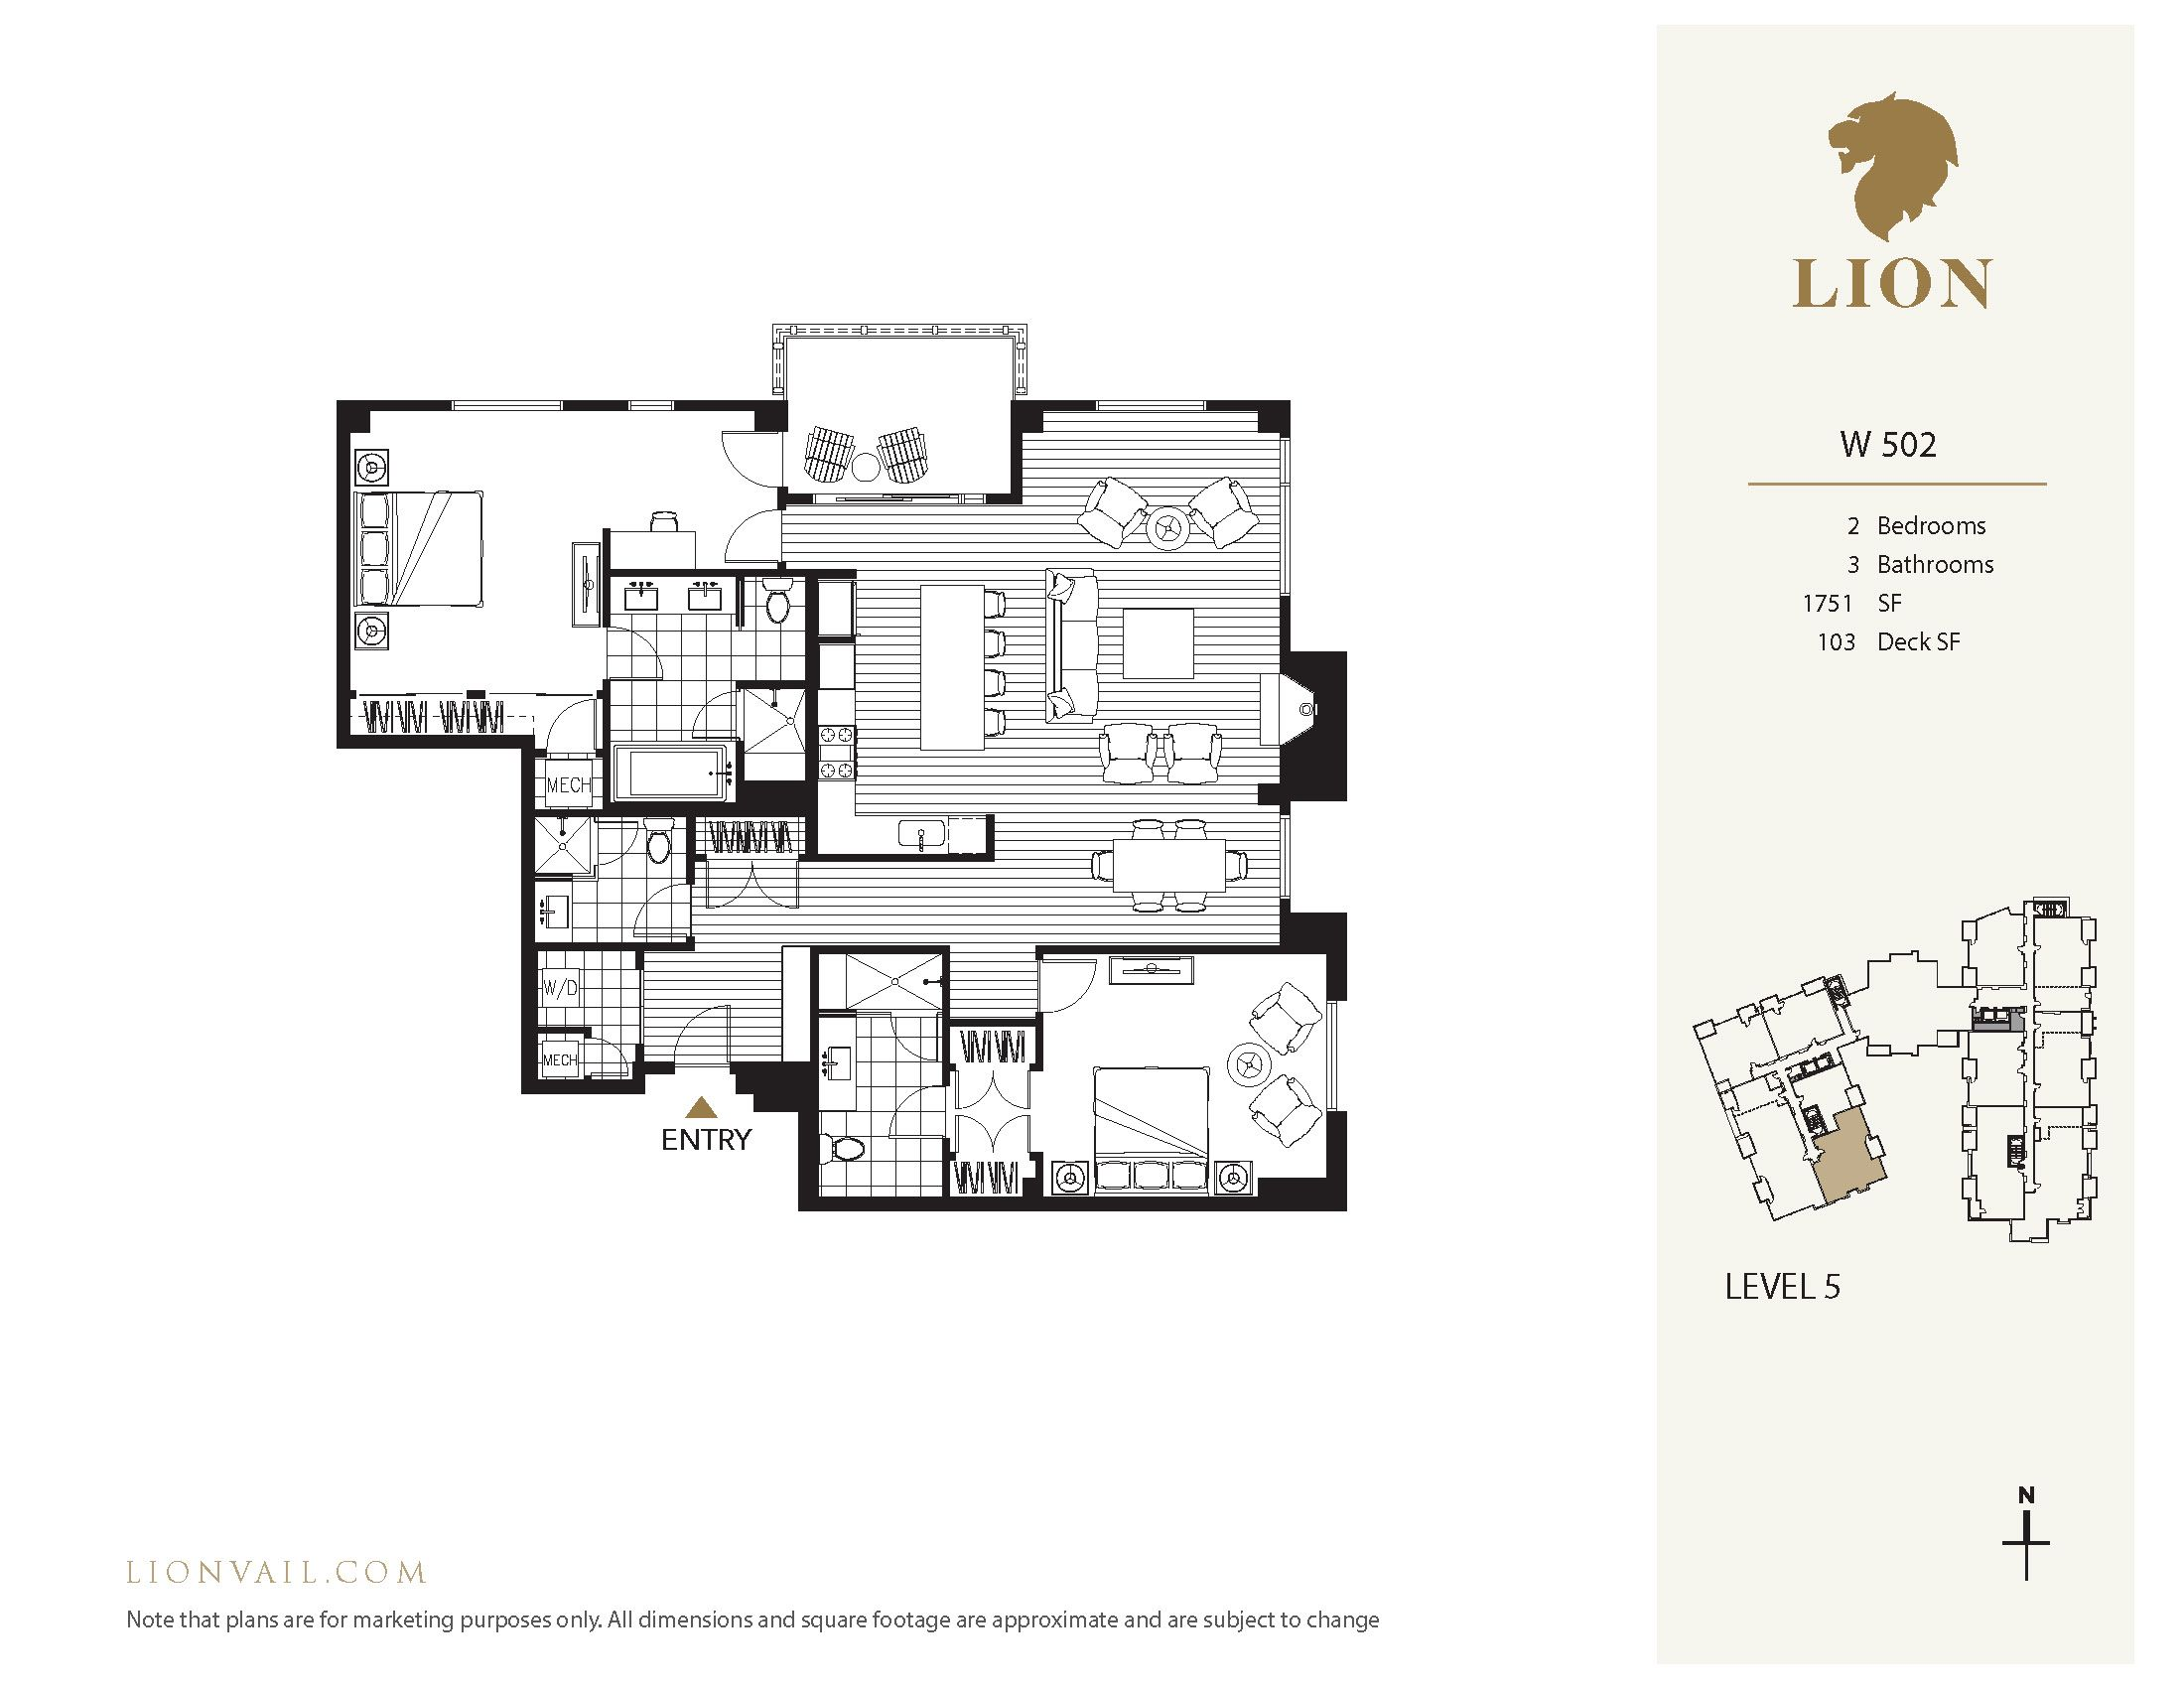 701 West Lionshead Circle - W502 Vail, CO 81657